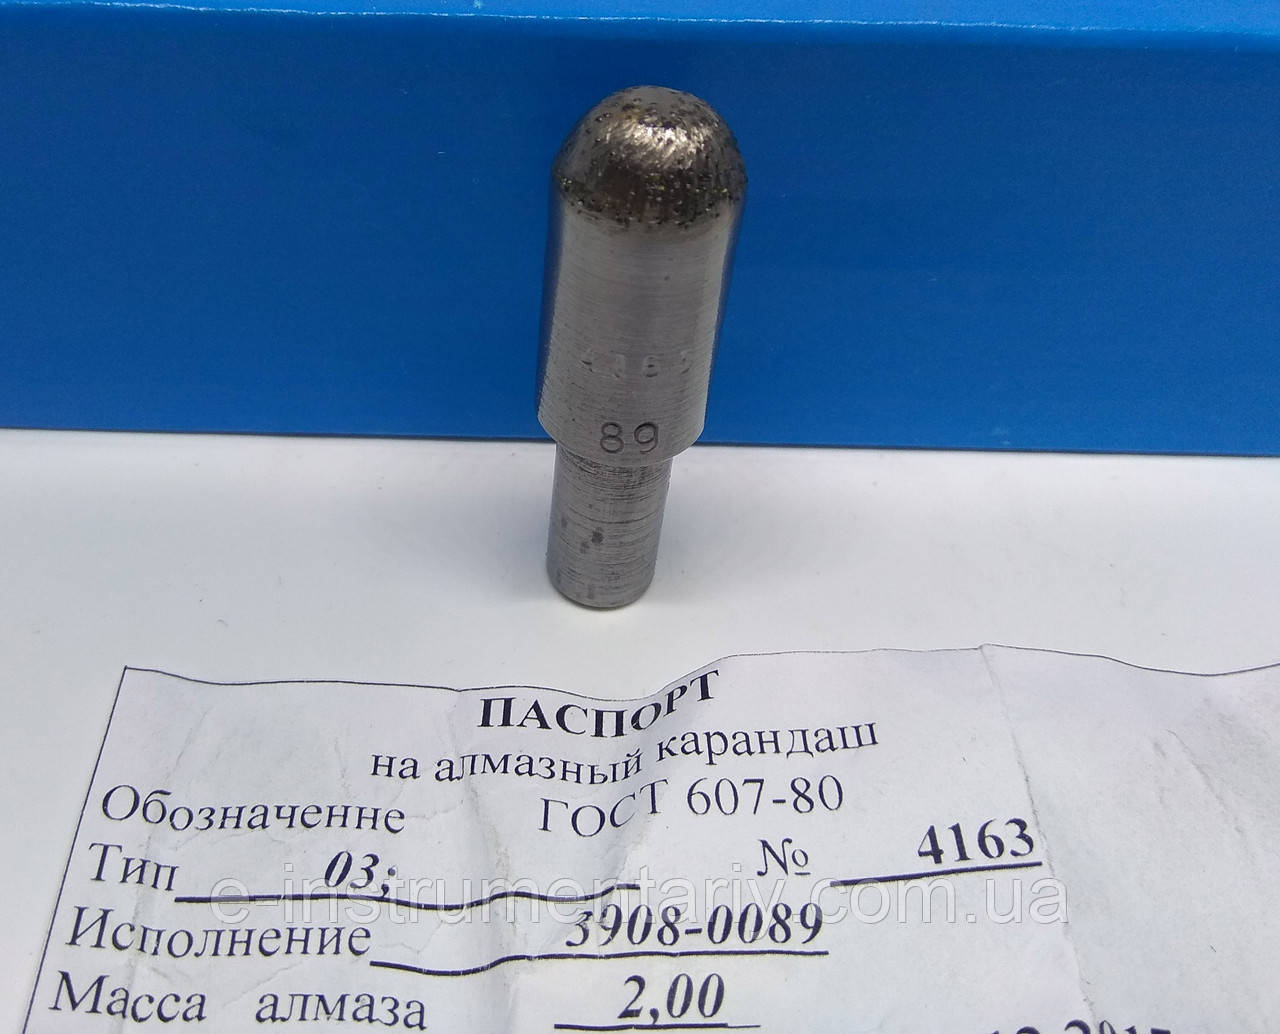 Карандаш алмазный 3908-0089 тип 03 исп.С 2,0 карат. качество- 1